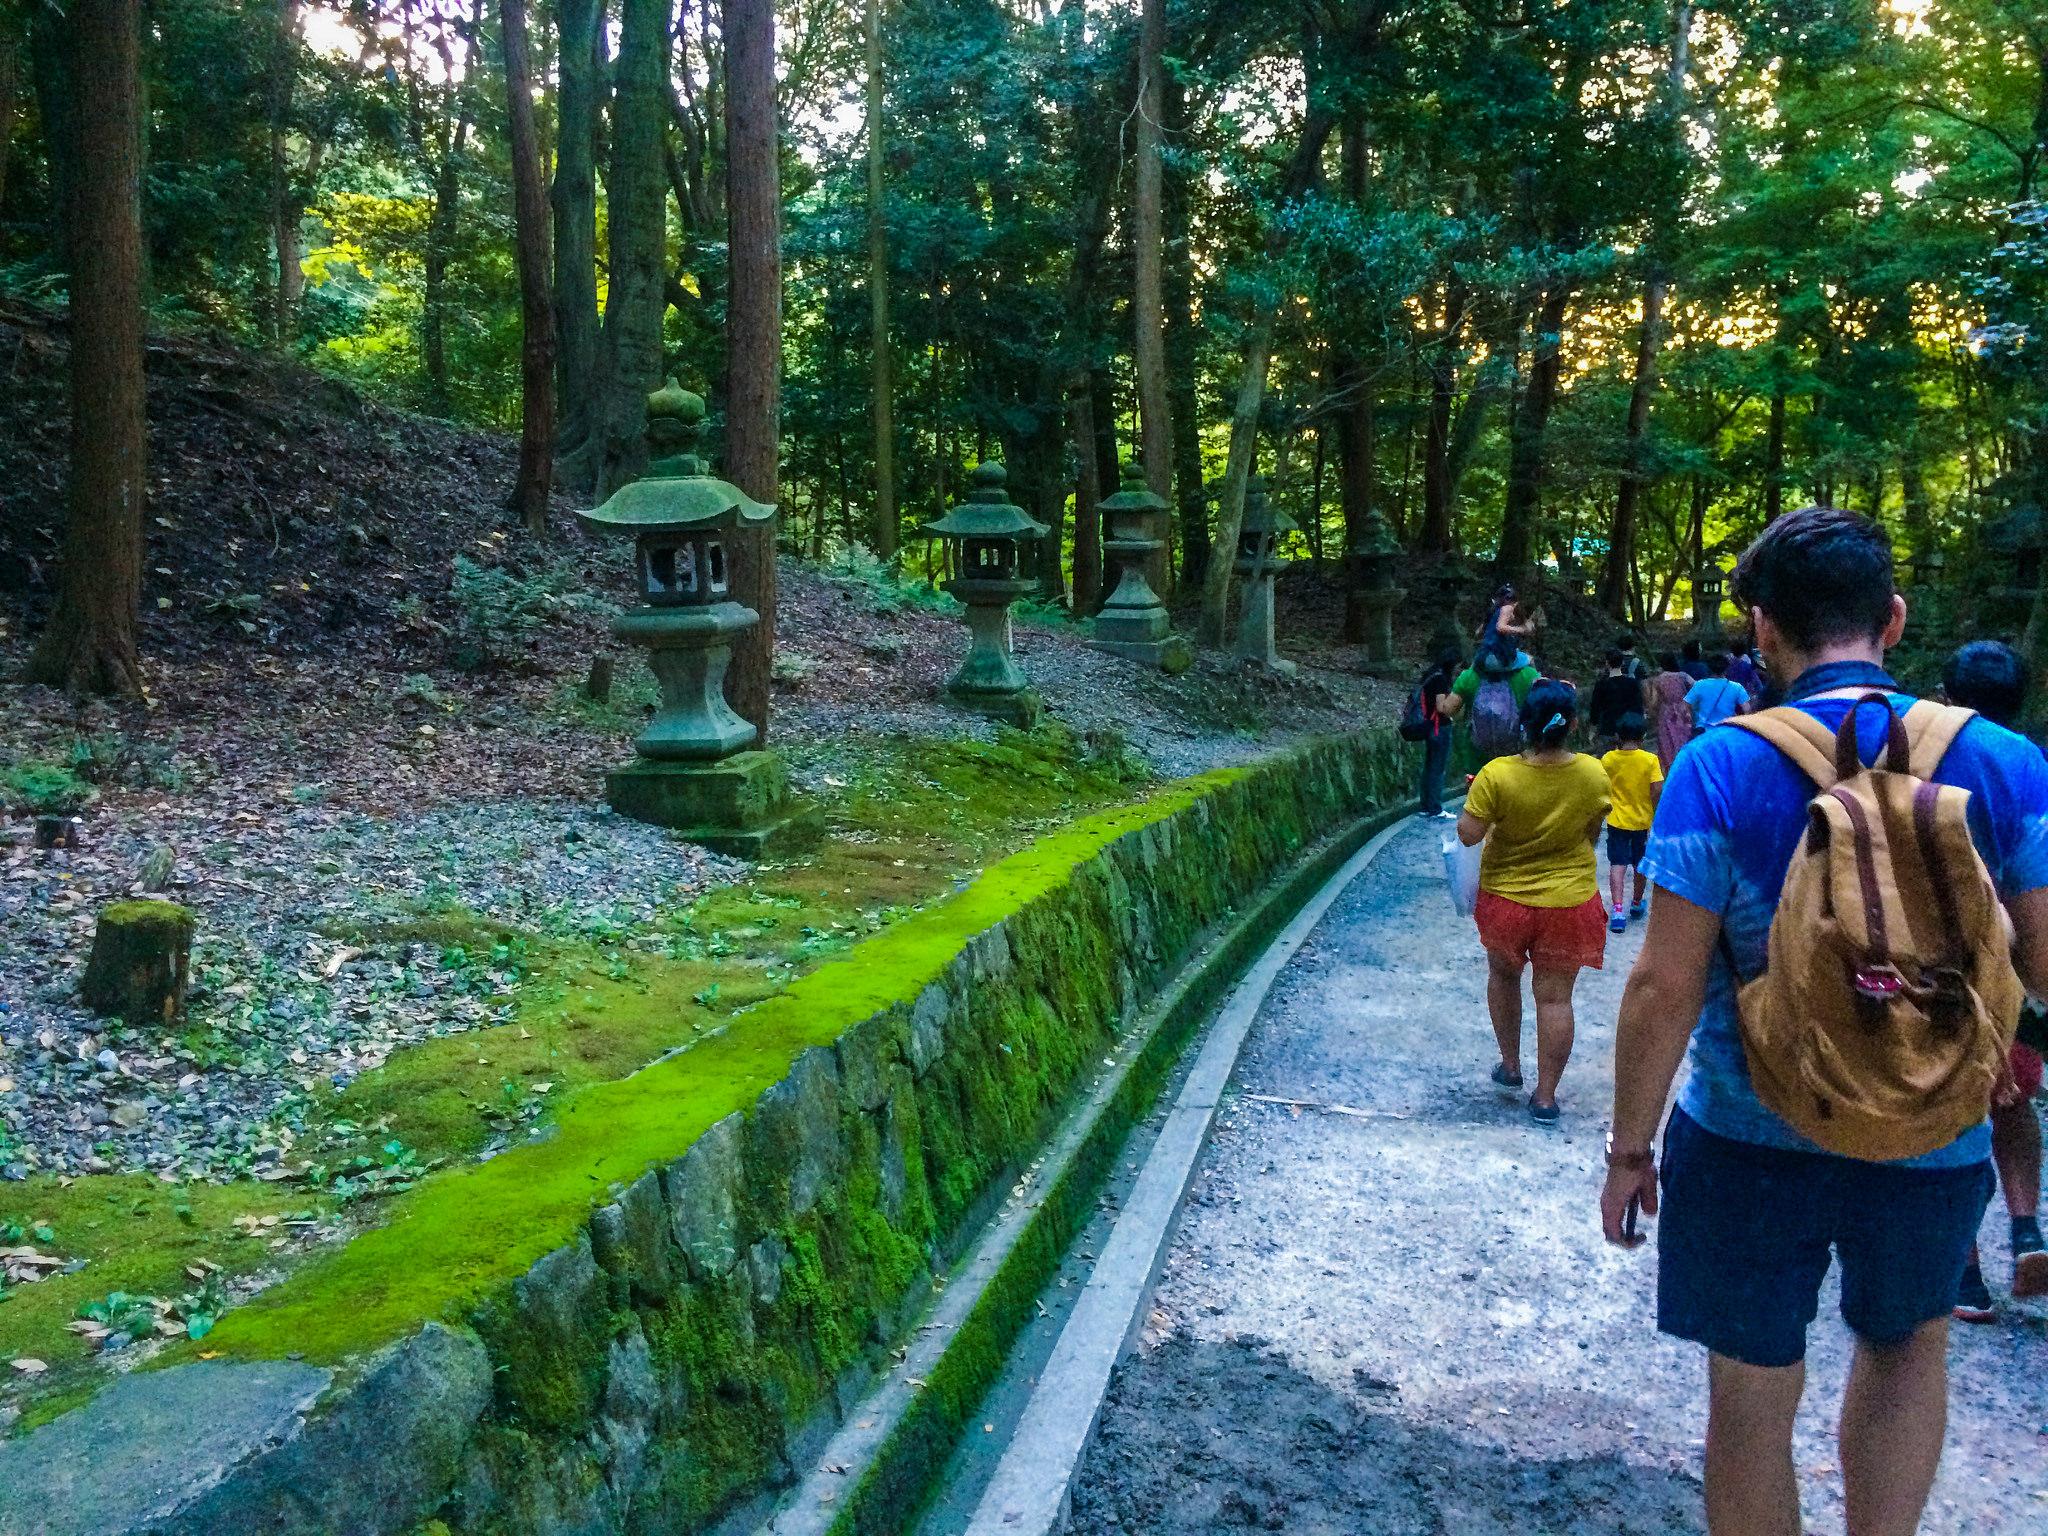 30284619801_3de1e5fded_k.jpgThe Ultimate Walking Tour of Kyoto's Incredible Fushimi Inari Shrine's 10,000 torii gates